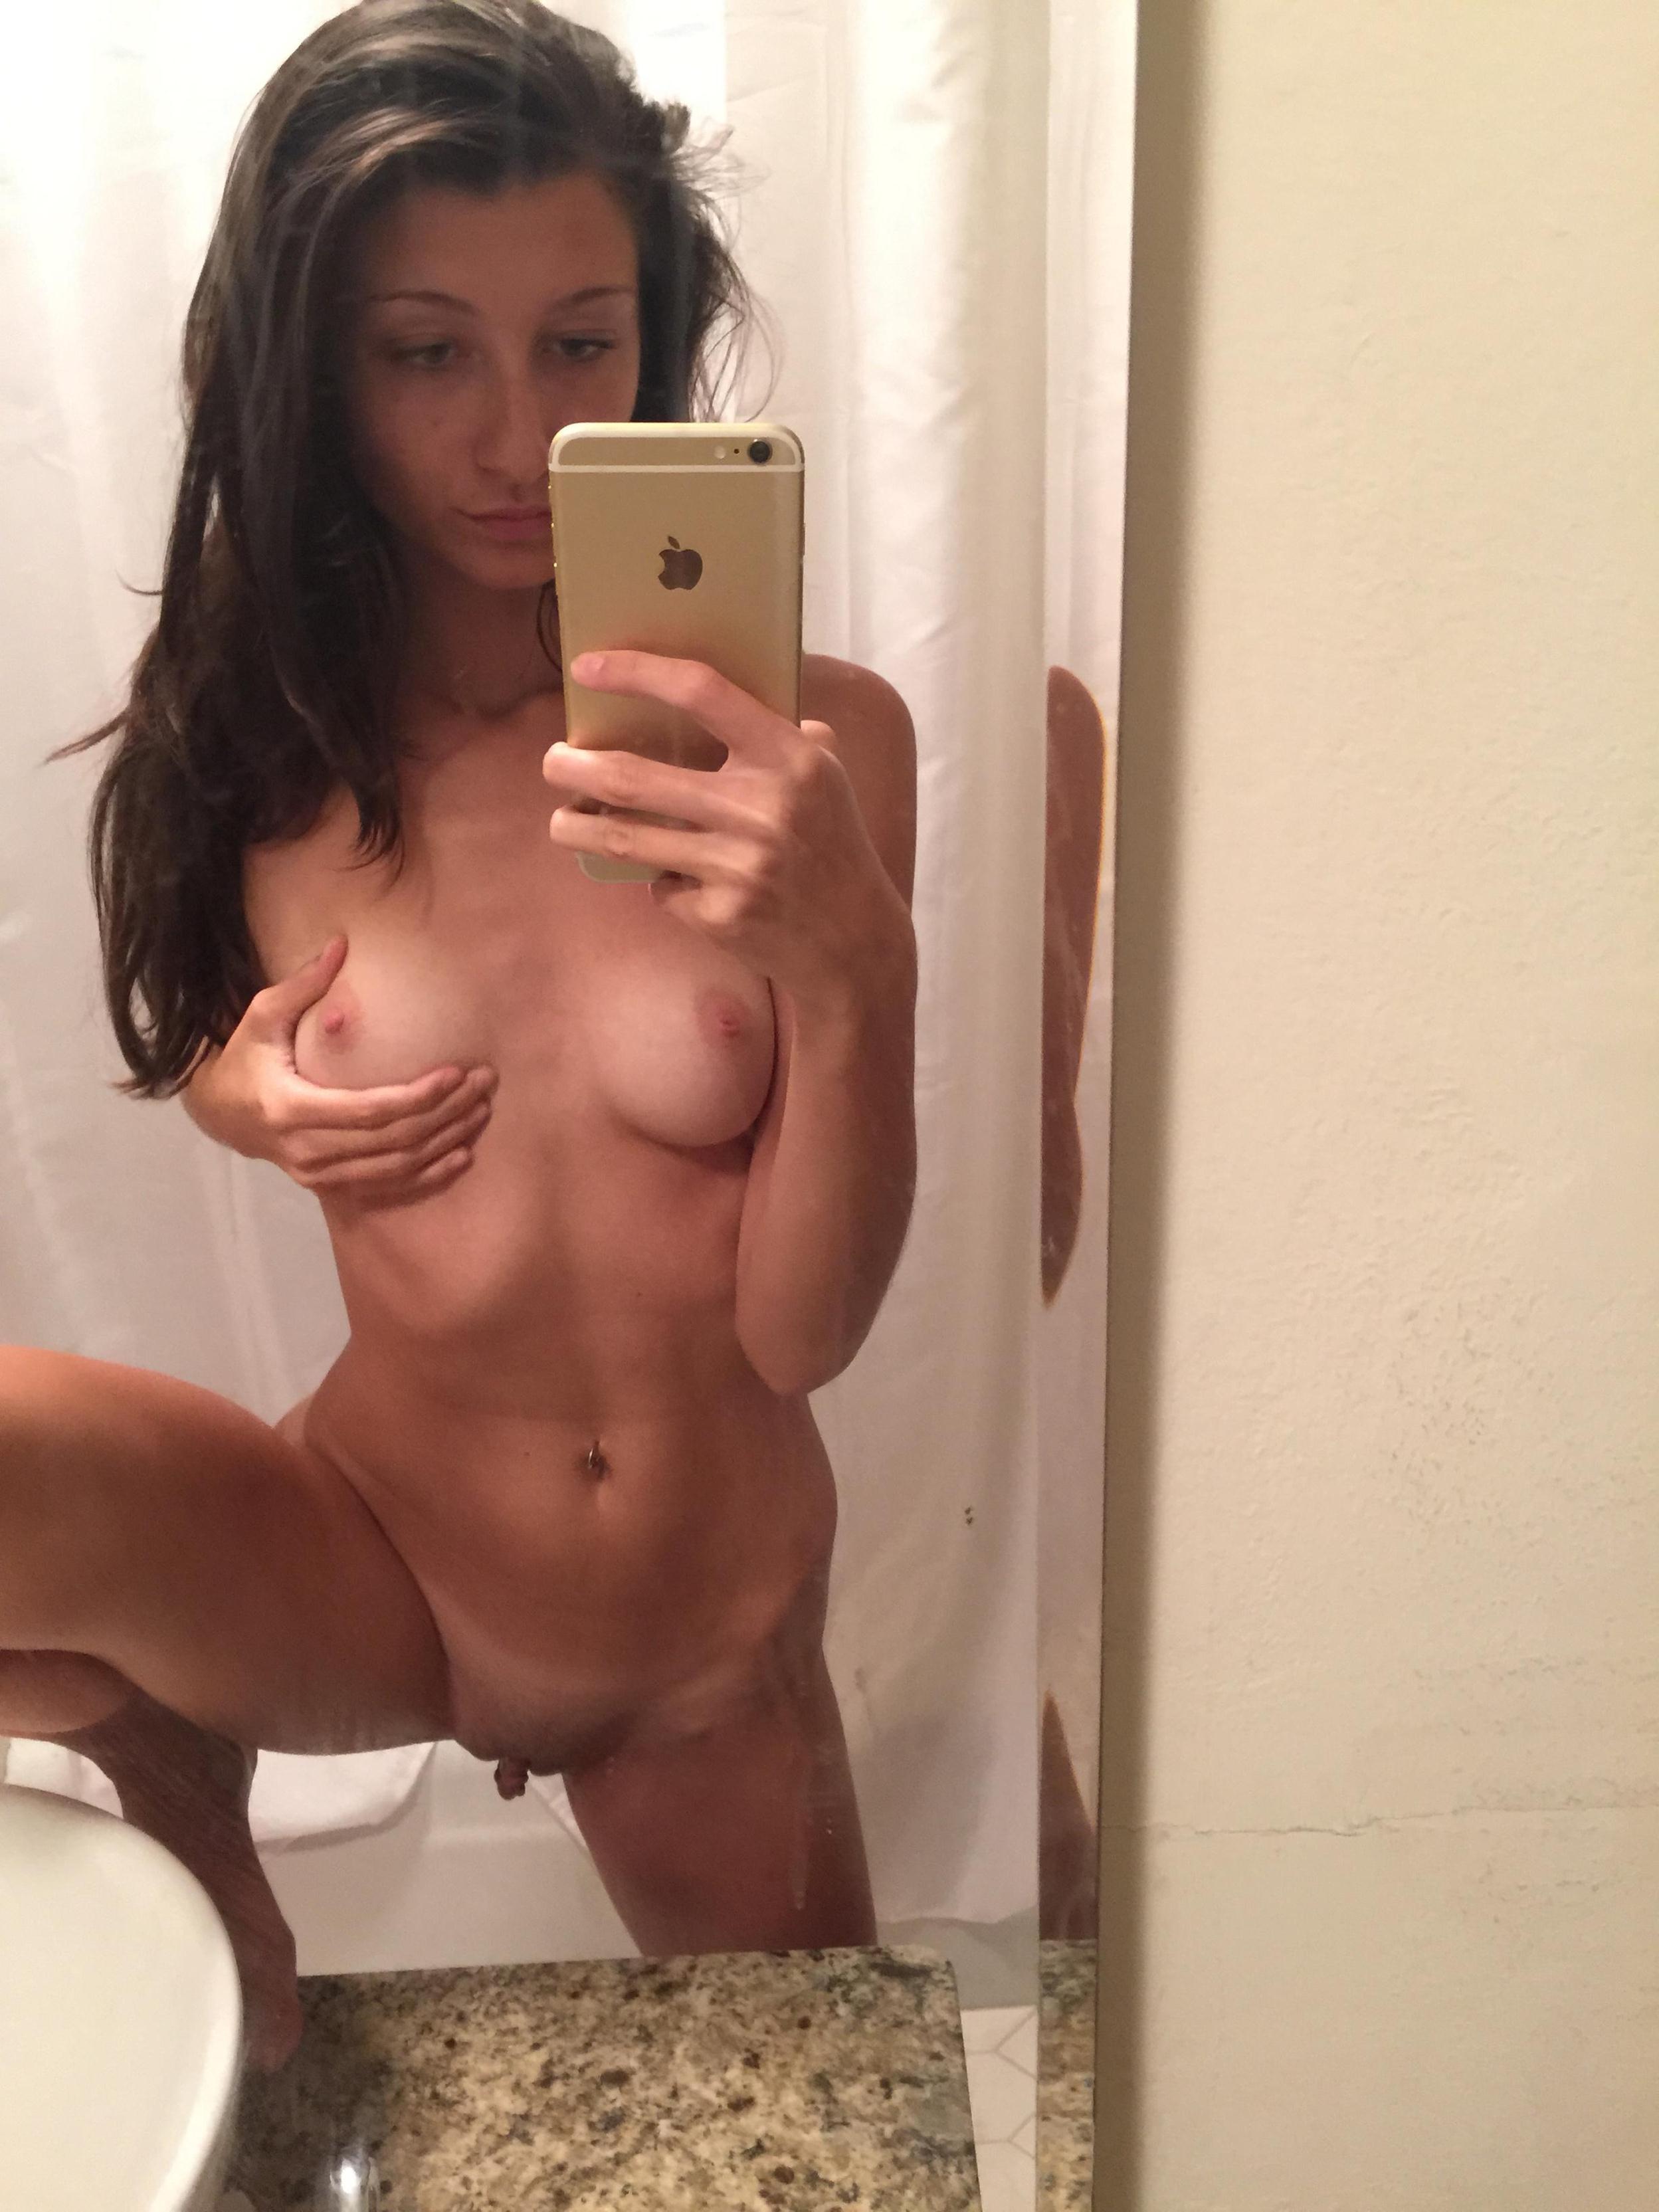 slim-body-amateur-girl-selfie-pics-mirror-nude-18